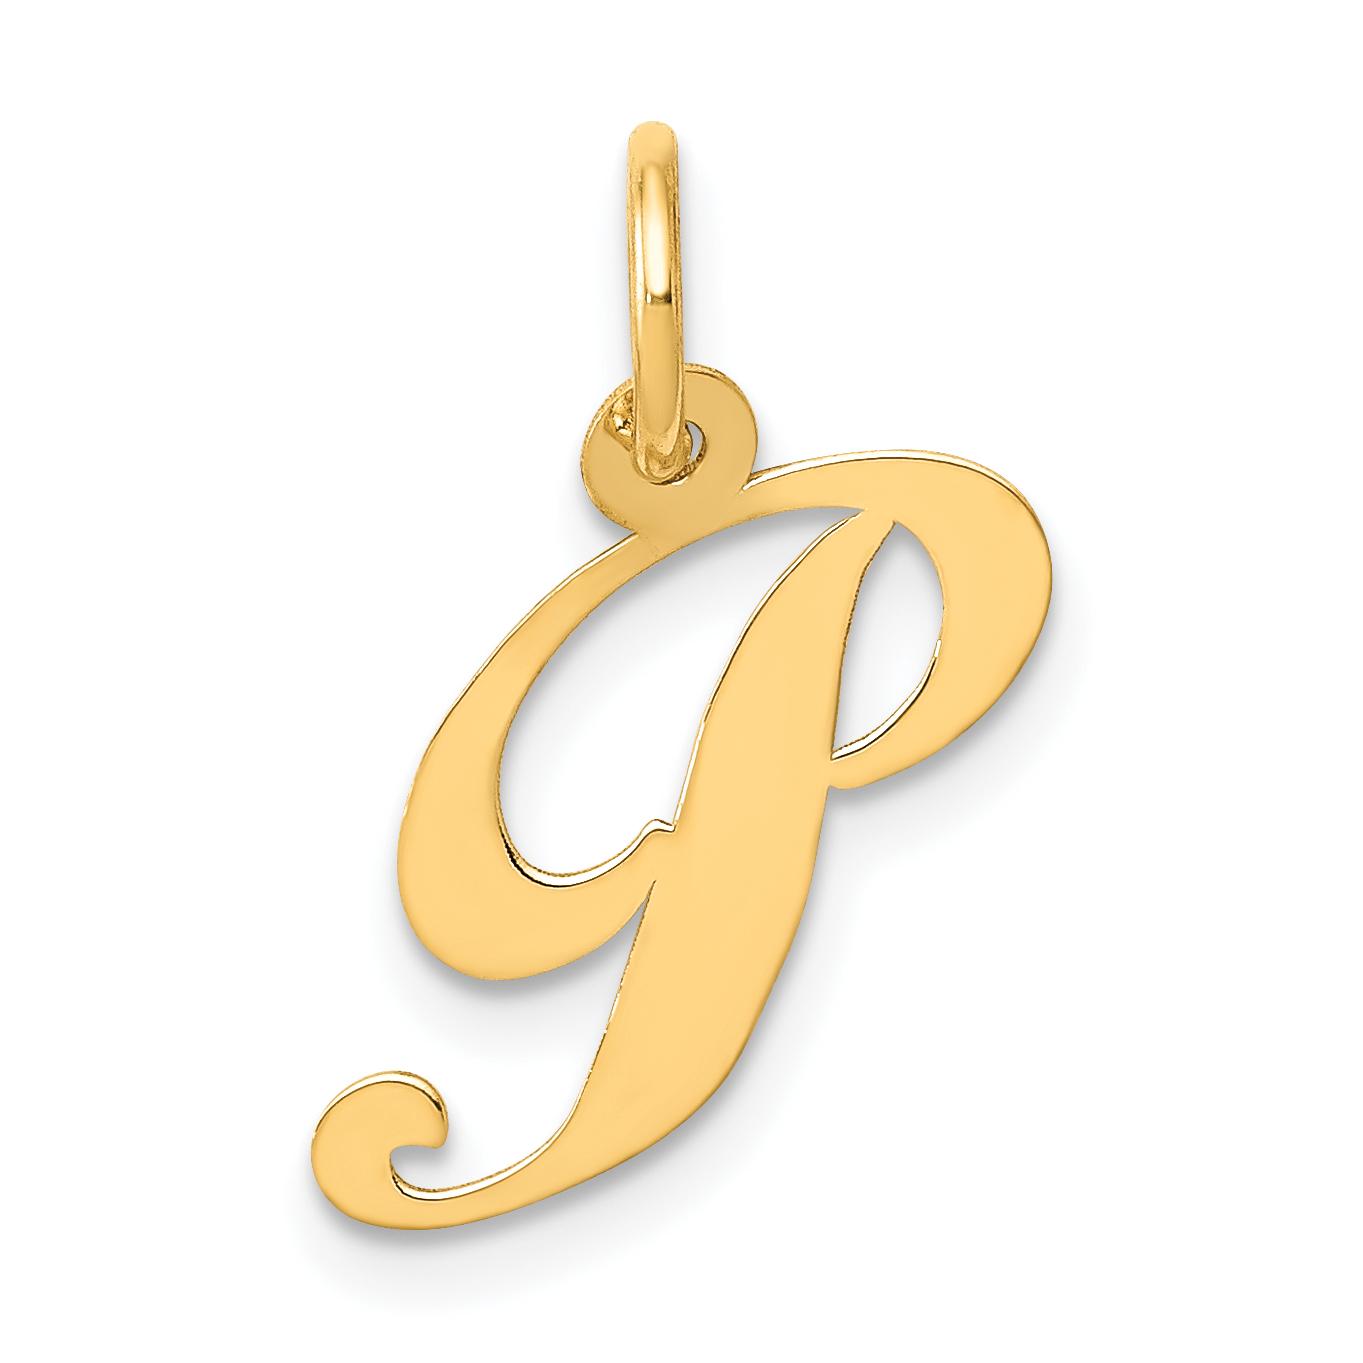 Jewel Tie 14k Yellow Gold Initial P Pendant Charm